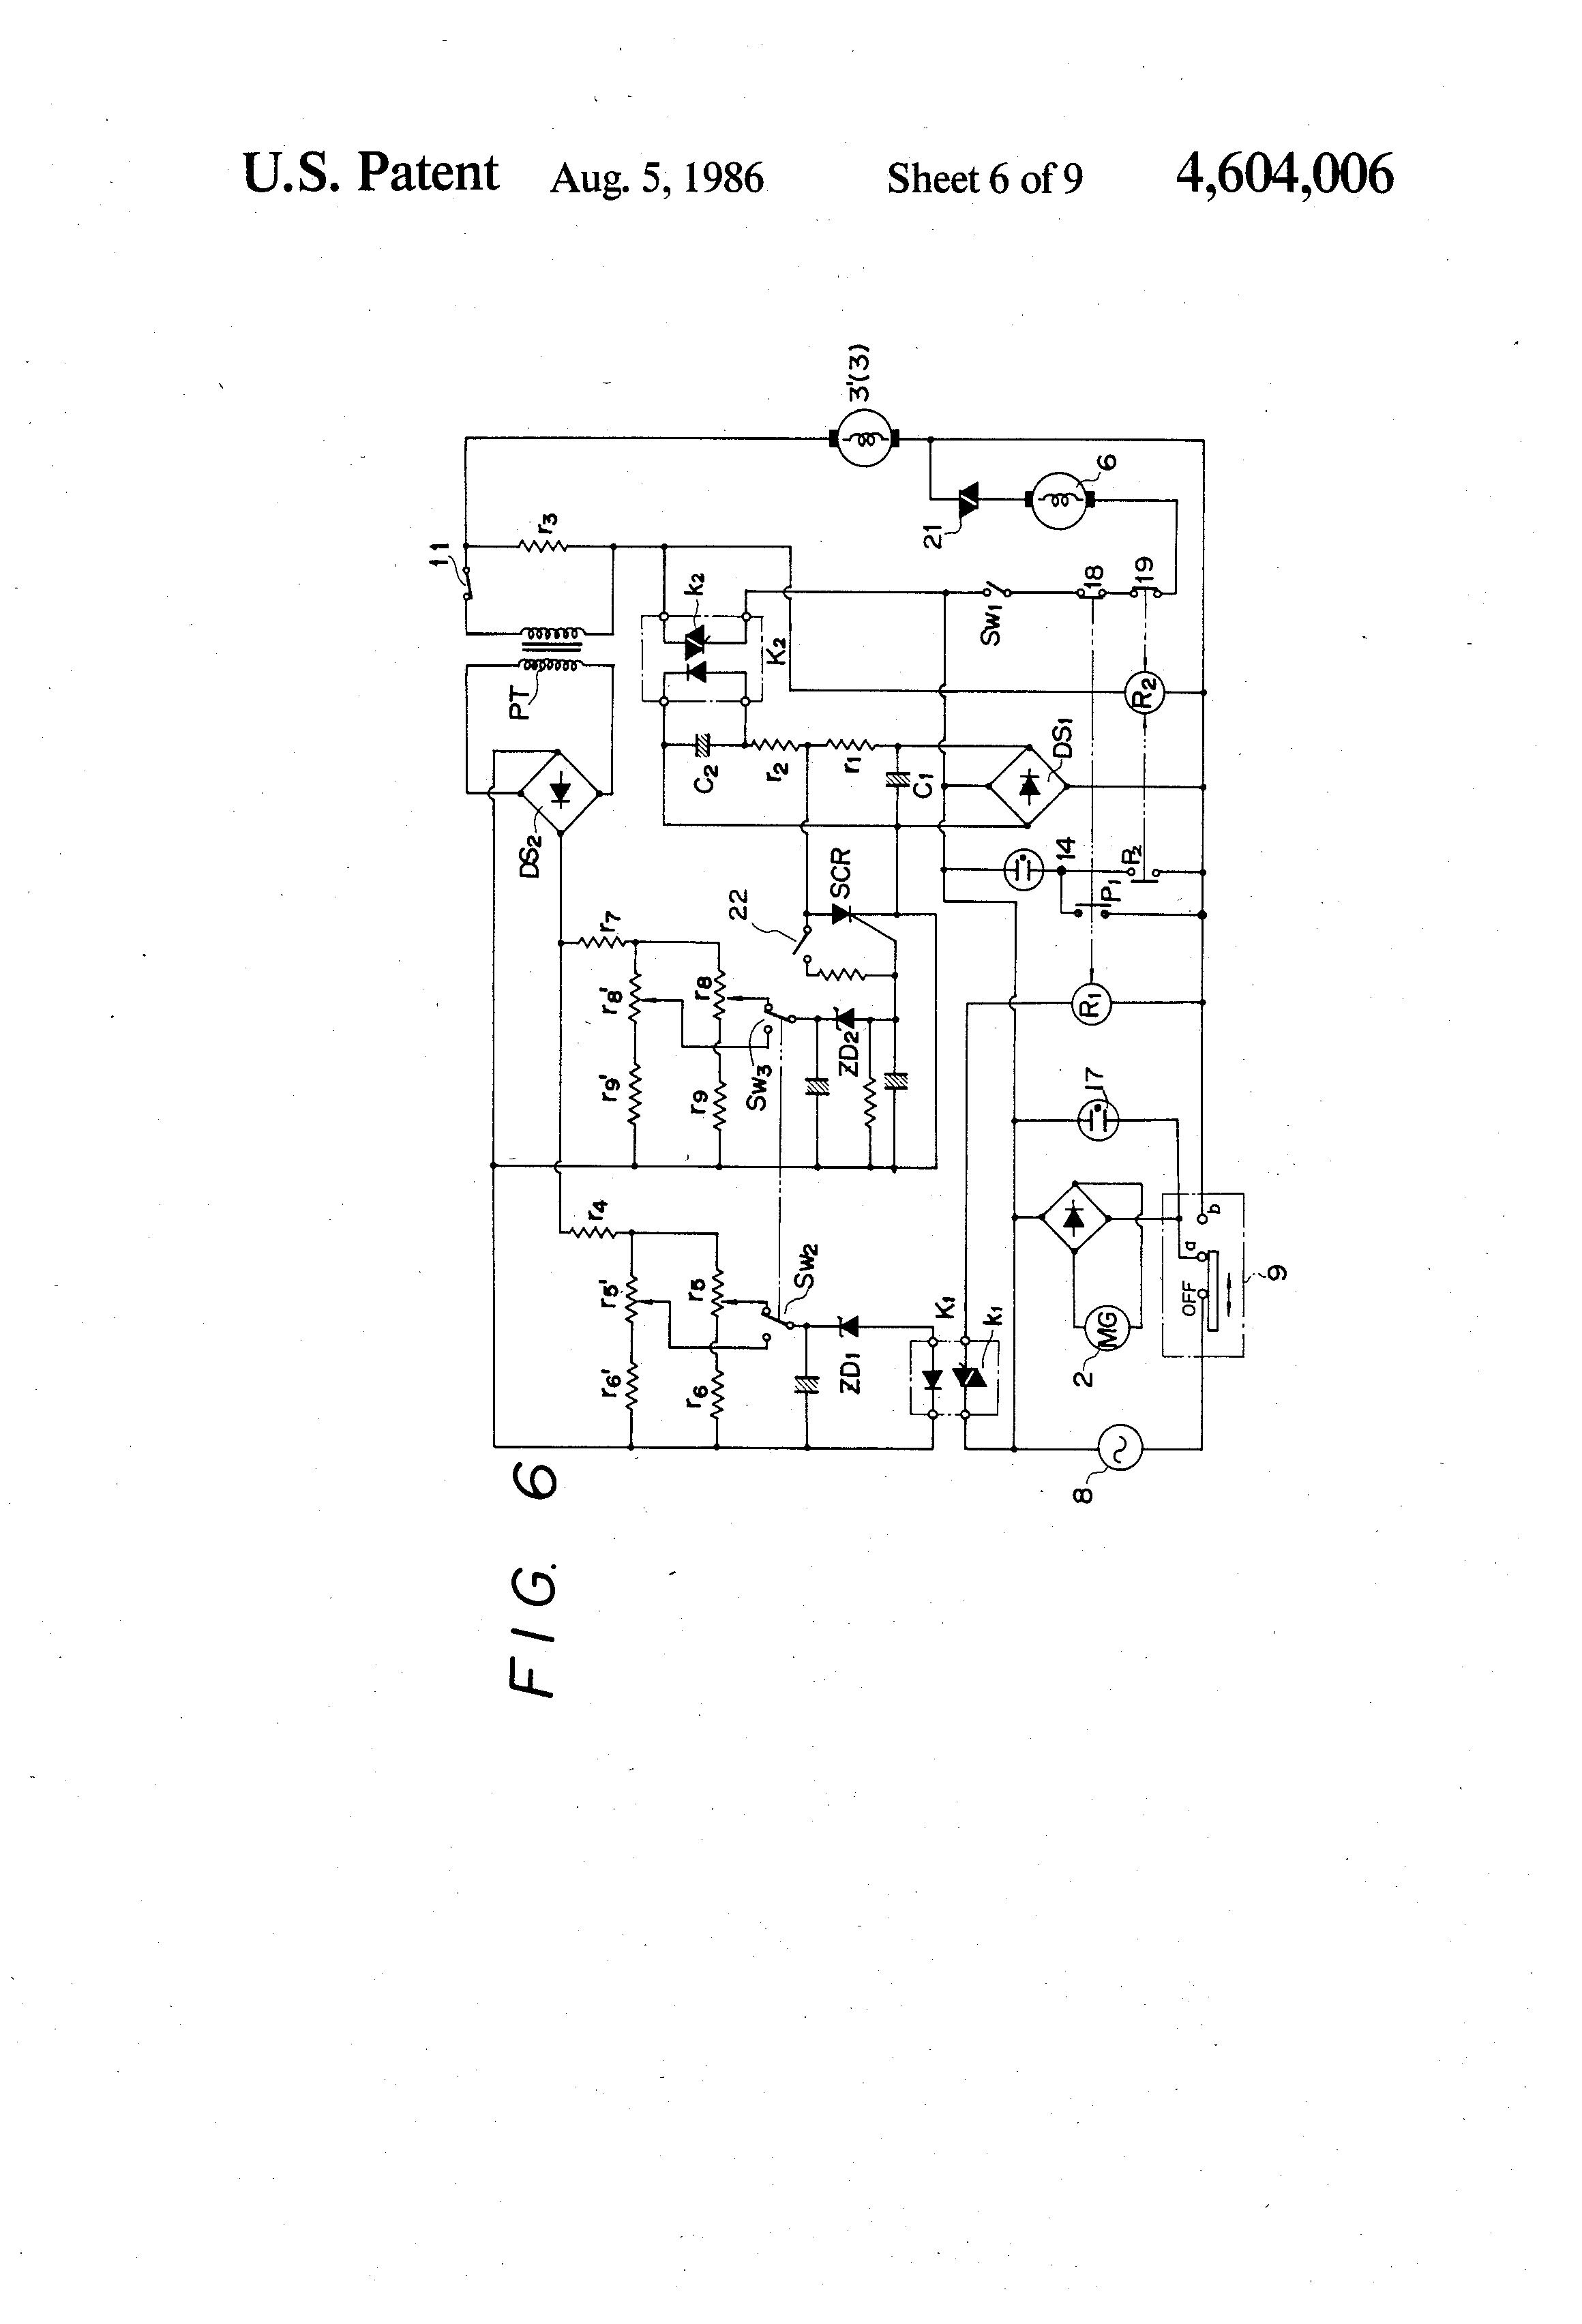 Fg Wilson Wiring Diagram Pdf : Eim wiring diagram q see camera